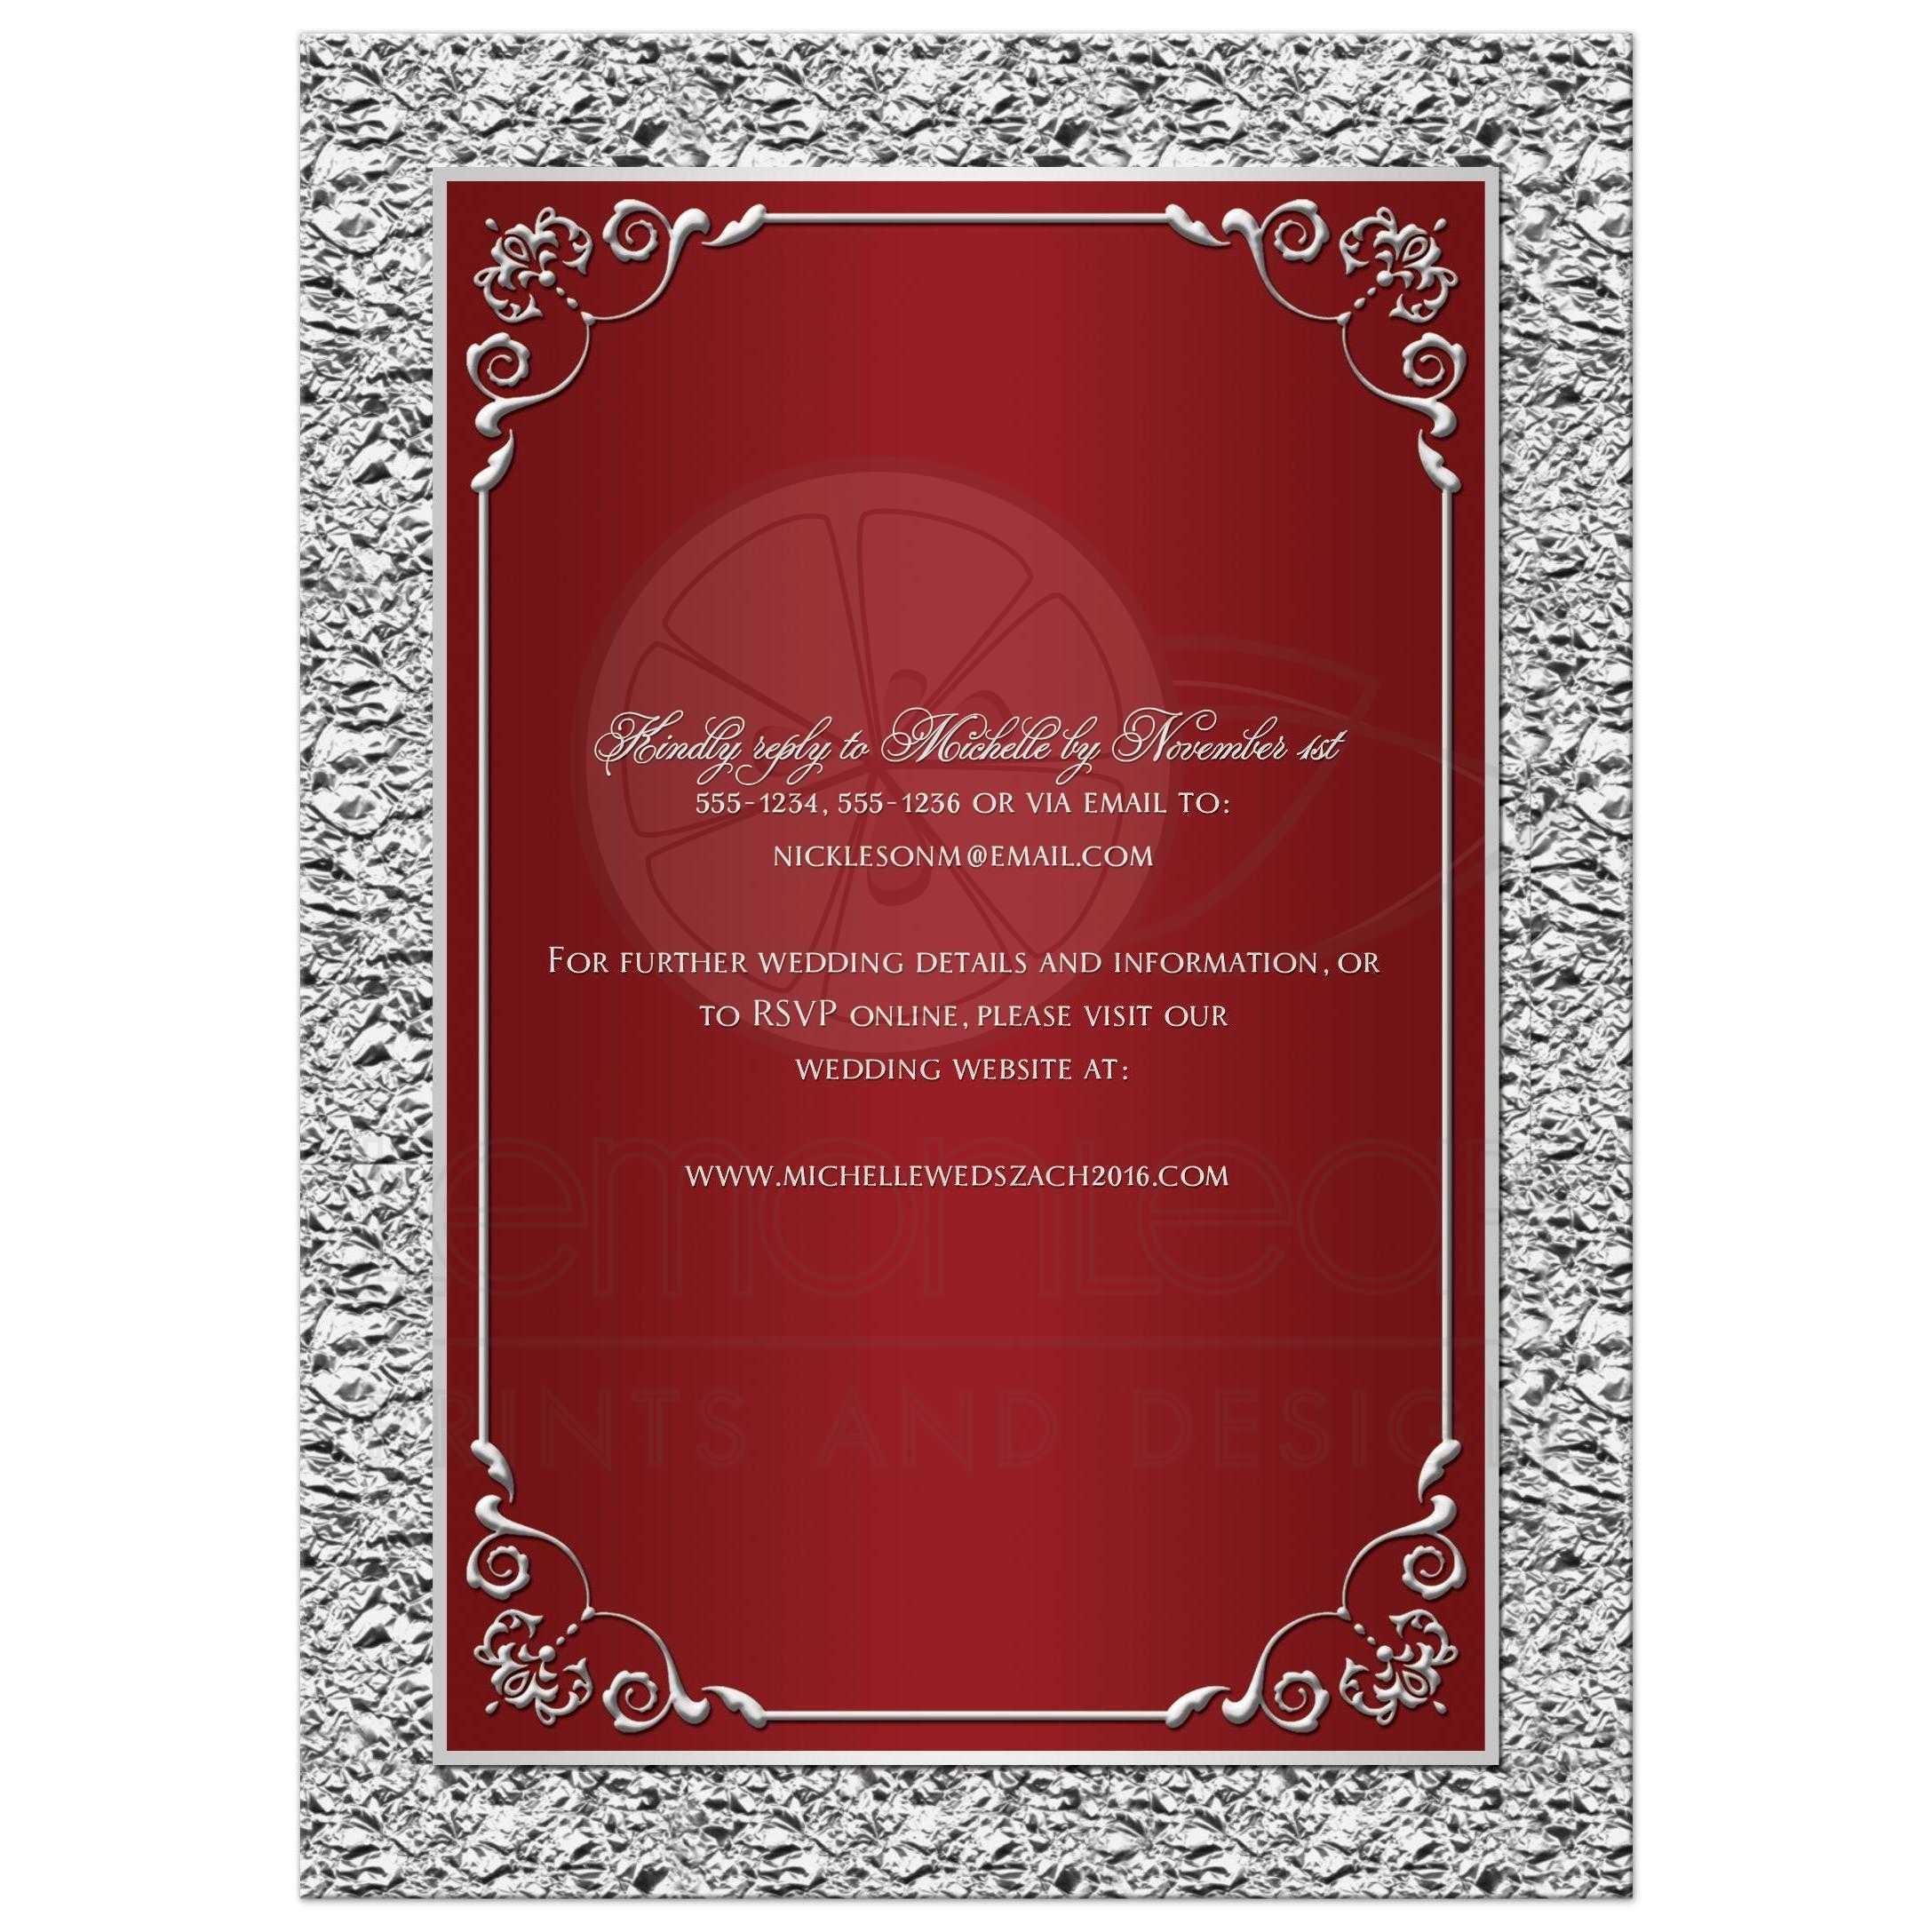 Wedding Invitation | Red, Silver Scrolls | Faux Silver Foil